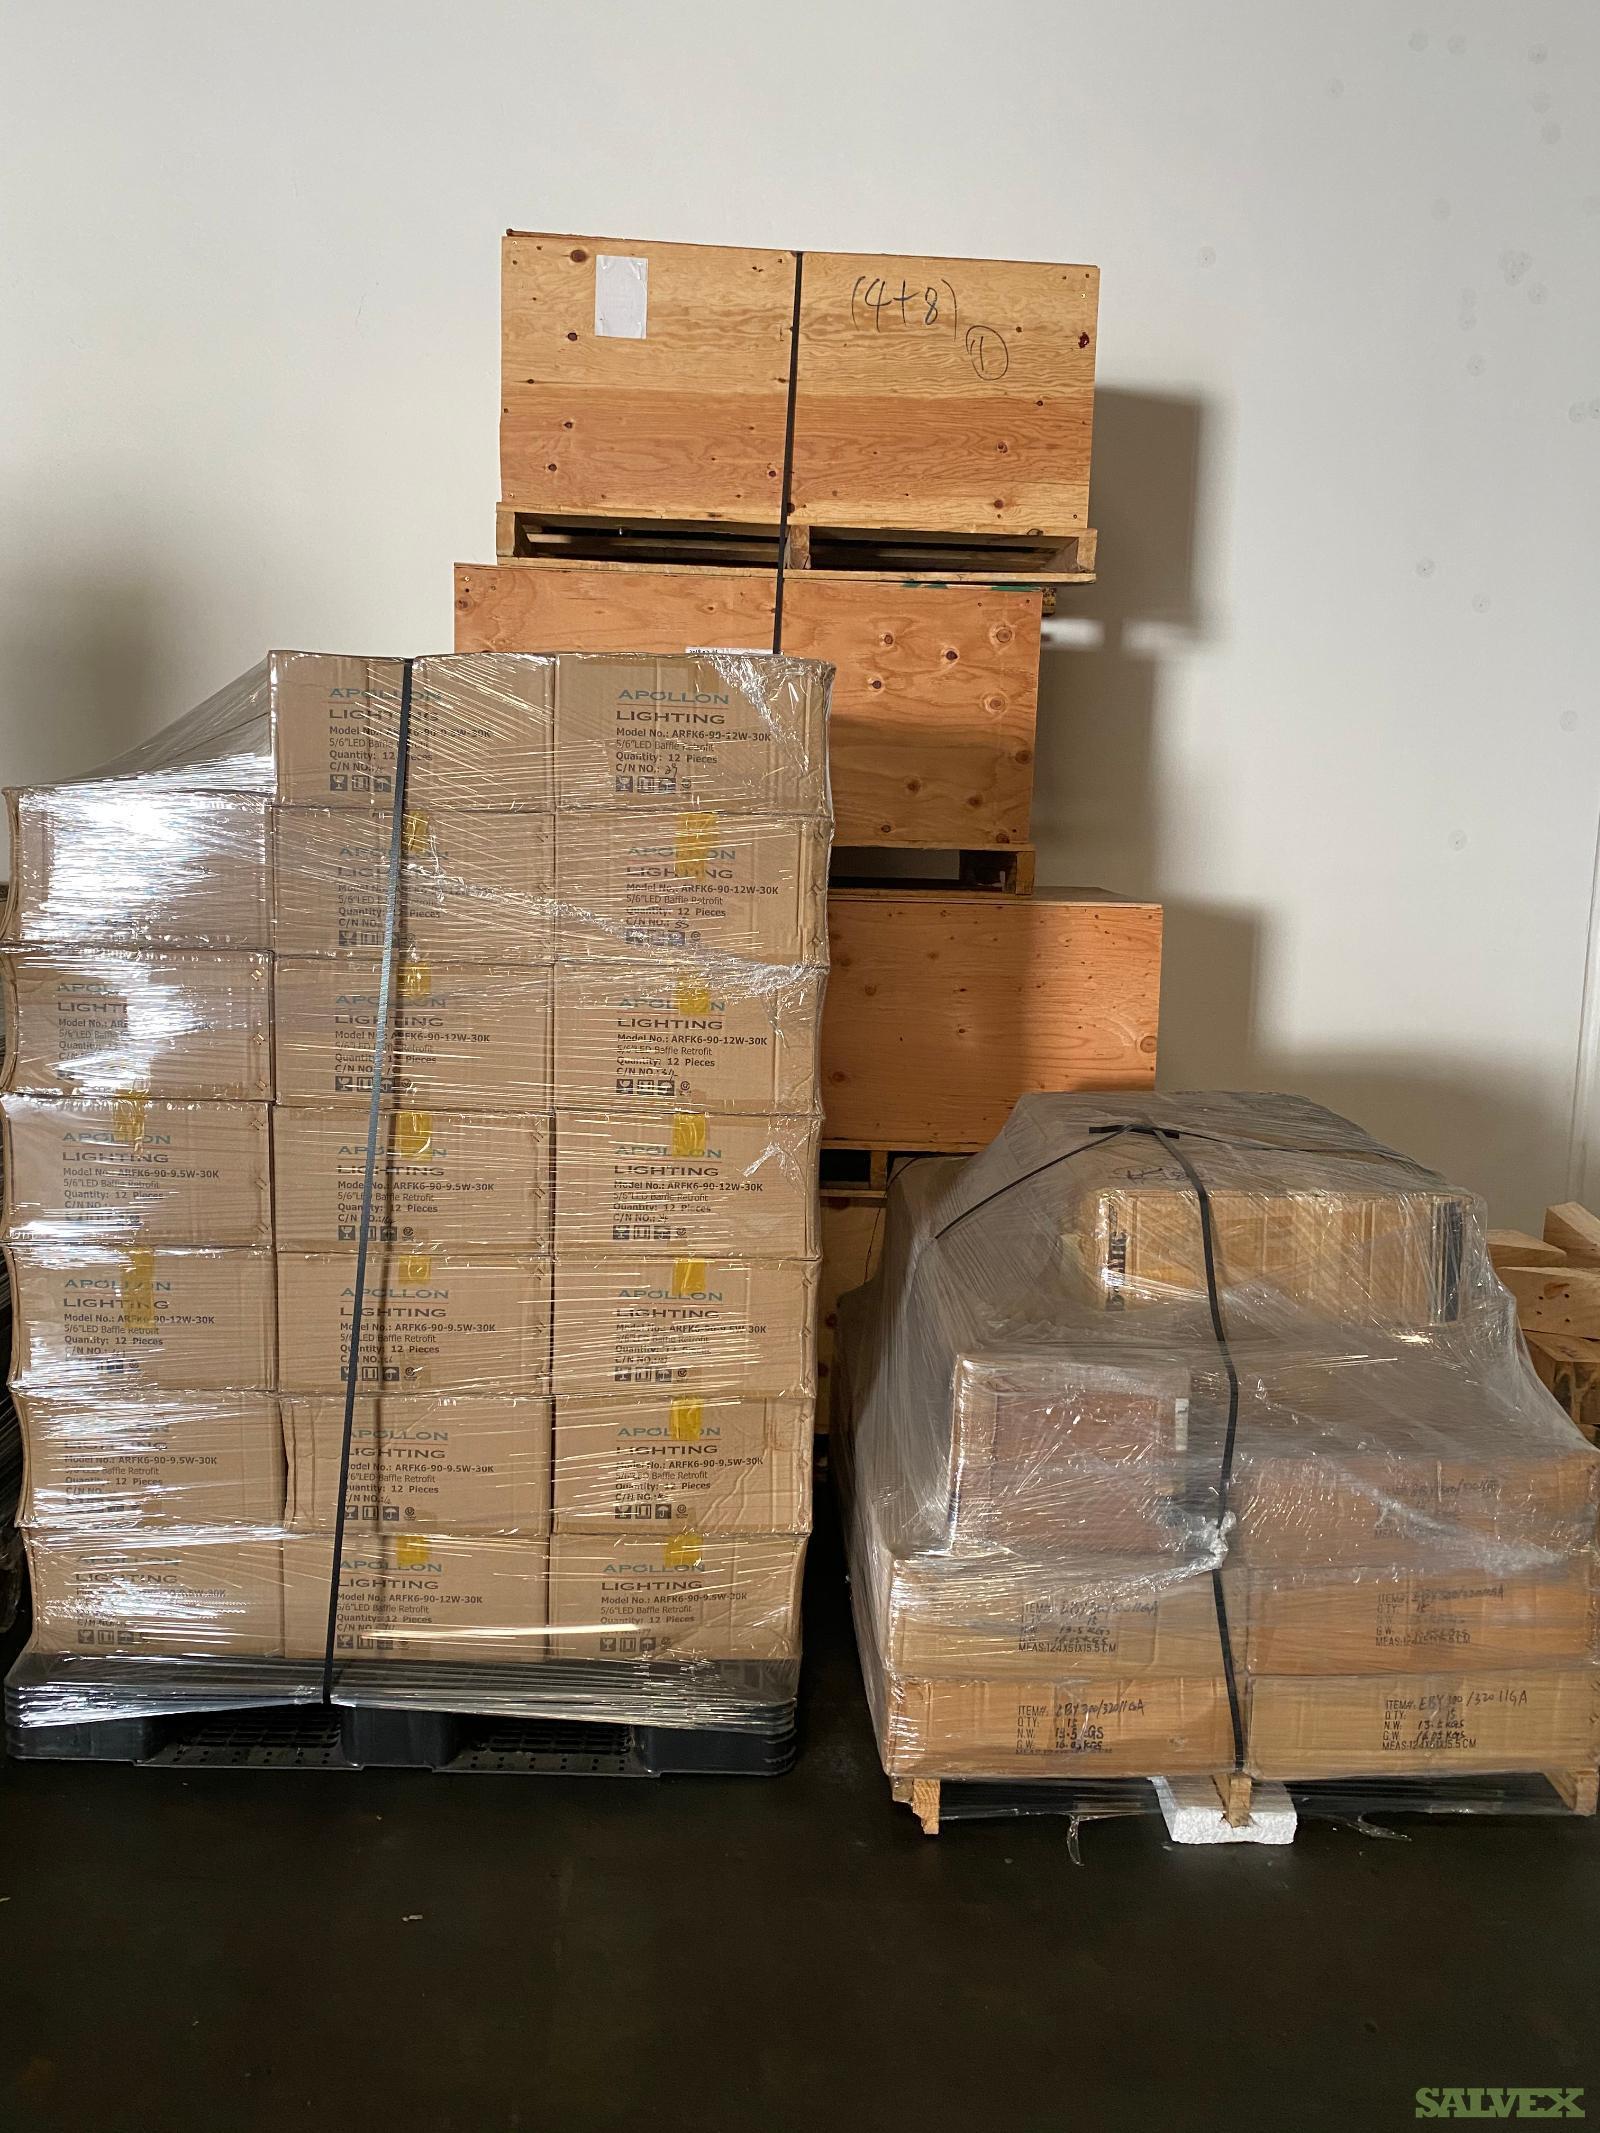 Electrical Parts: Led Trims, B Line Enclosures, Panel Back Boxes, Panel Board (888 units - 14 Pallets Total)